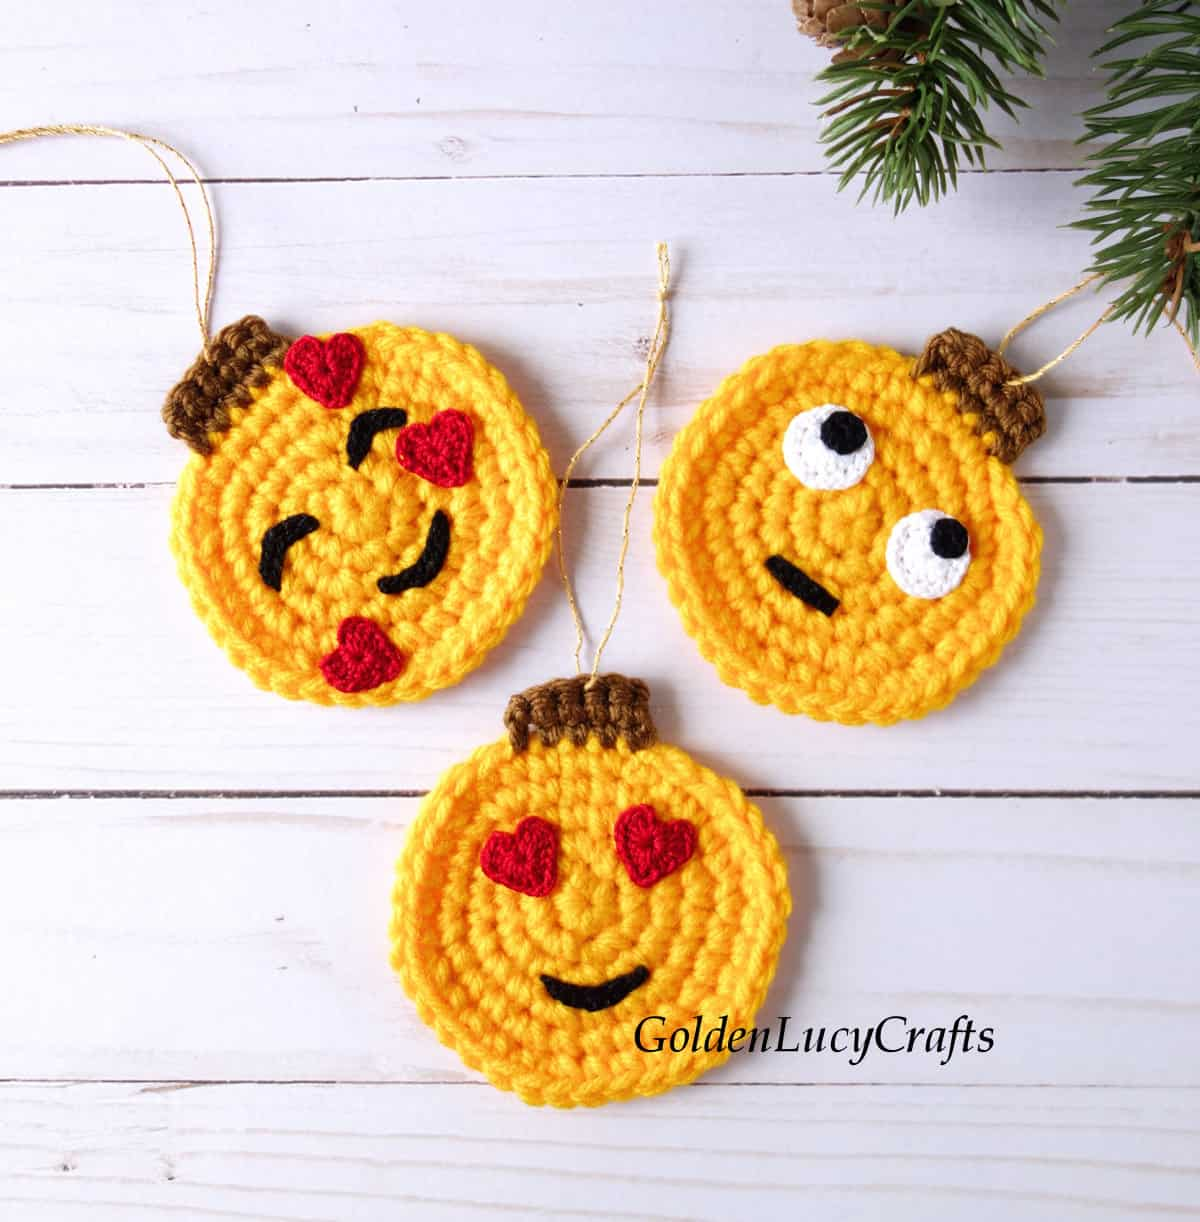 Three crochet emoji Christmas ornaments laying flat on the surface.